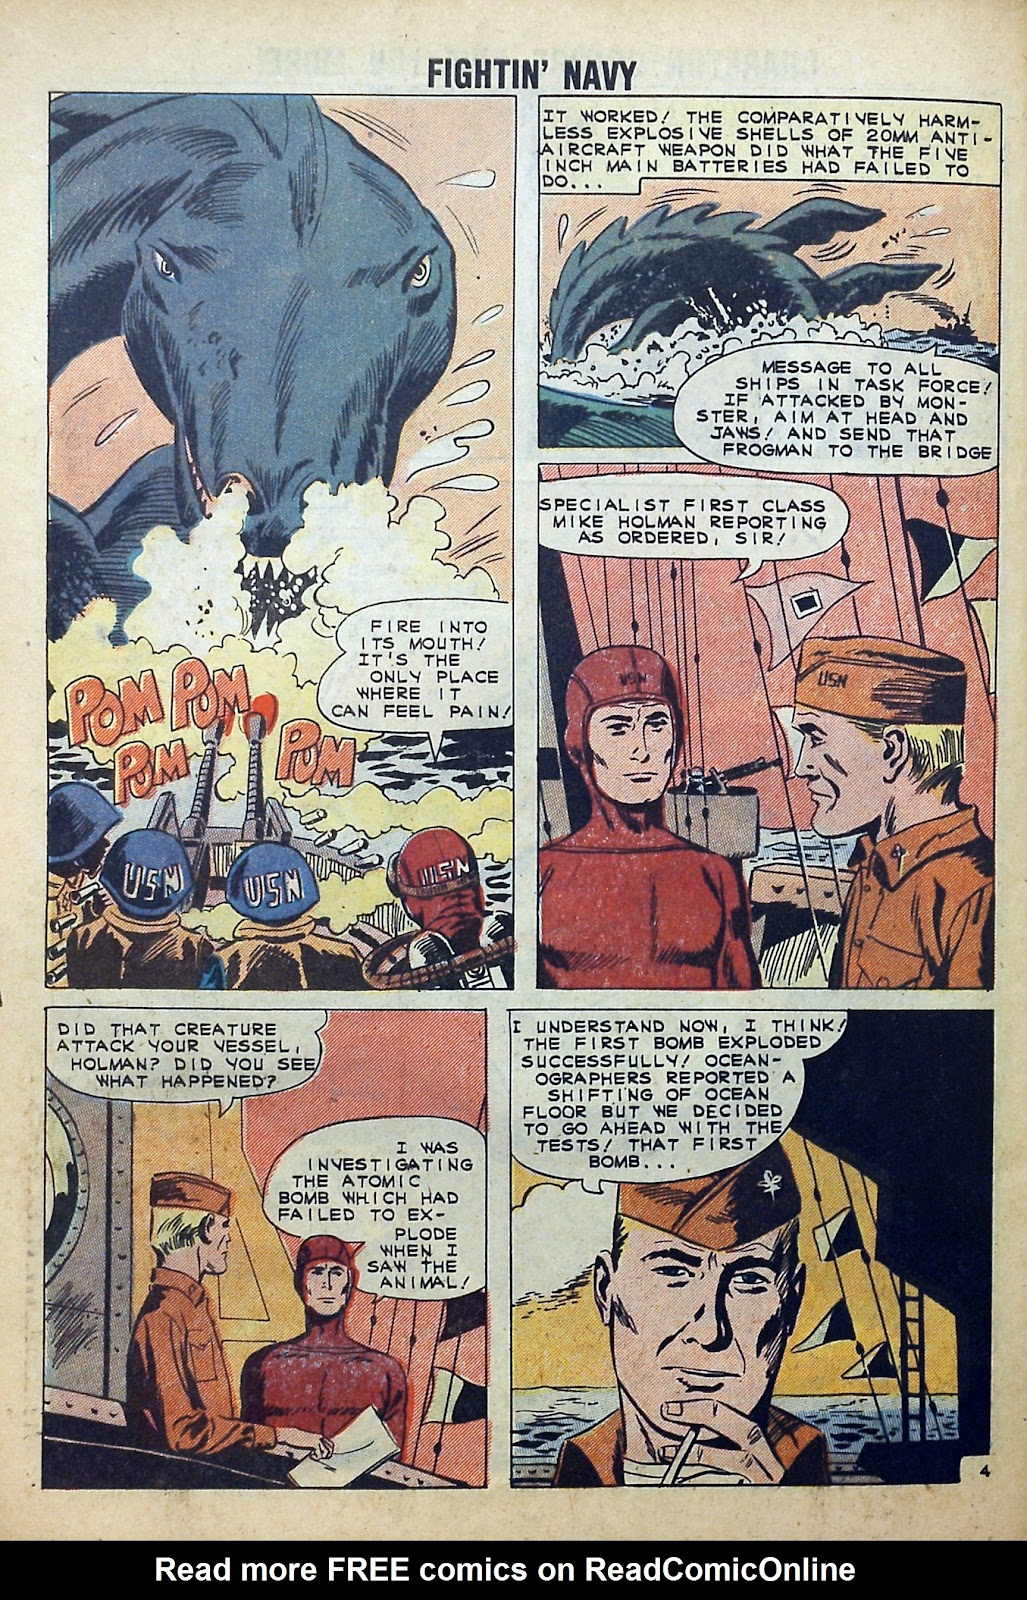 Read online Fightin' Navy comic -  Issue #99 - 28